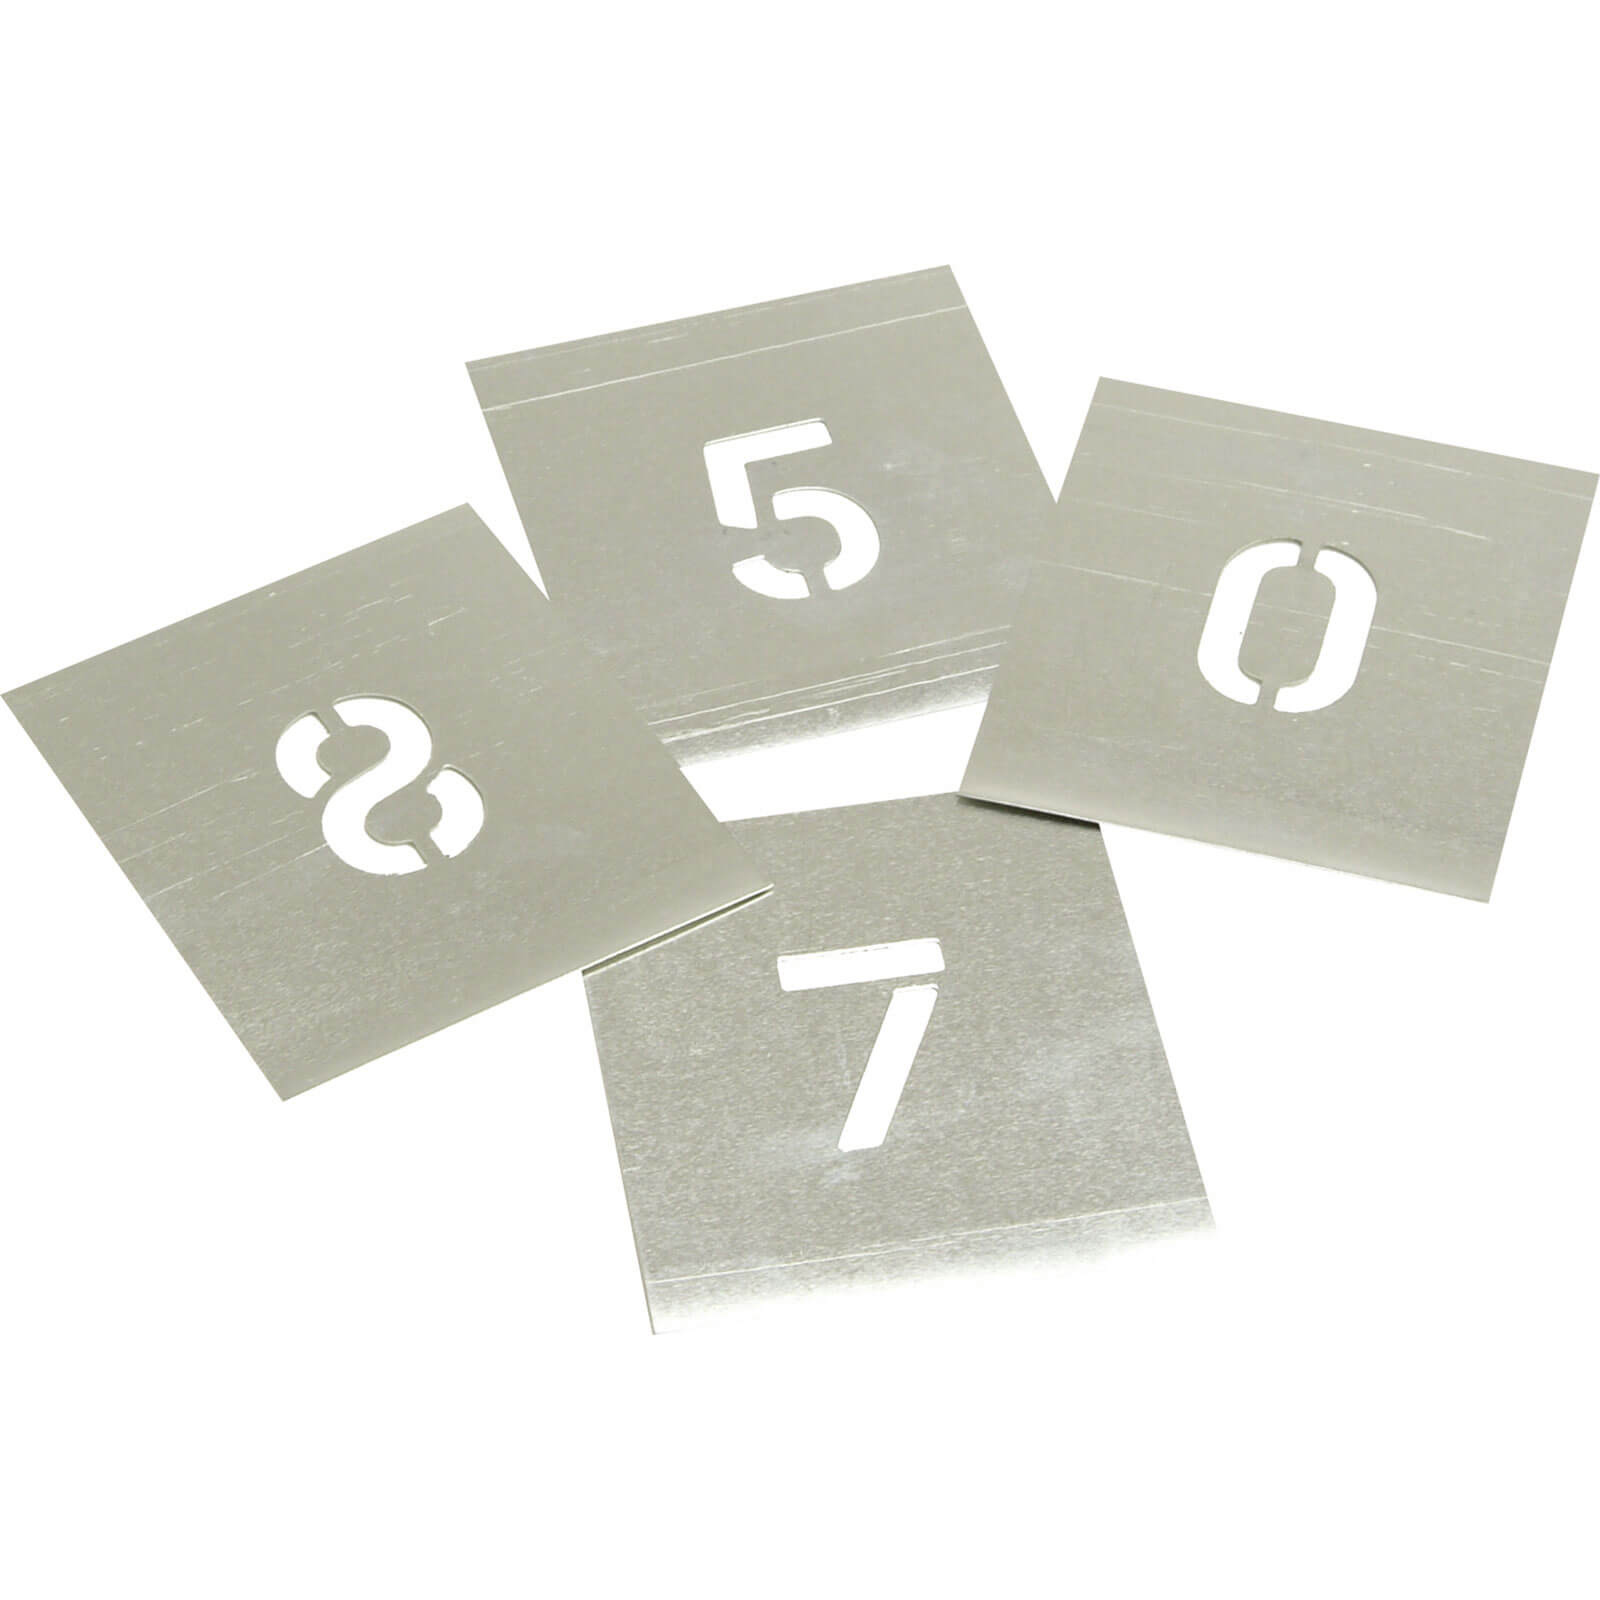 "Image of Stencils 8 Piece Zinc Number Stencil Set 1"""